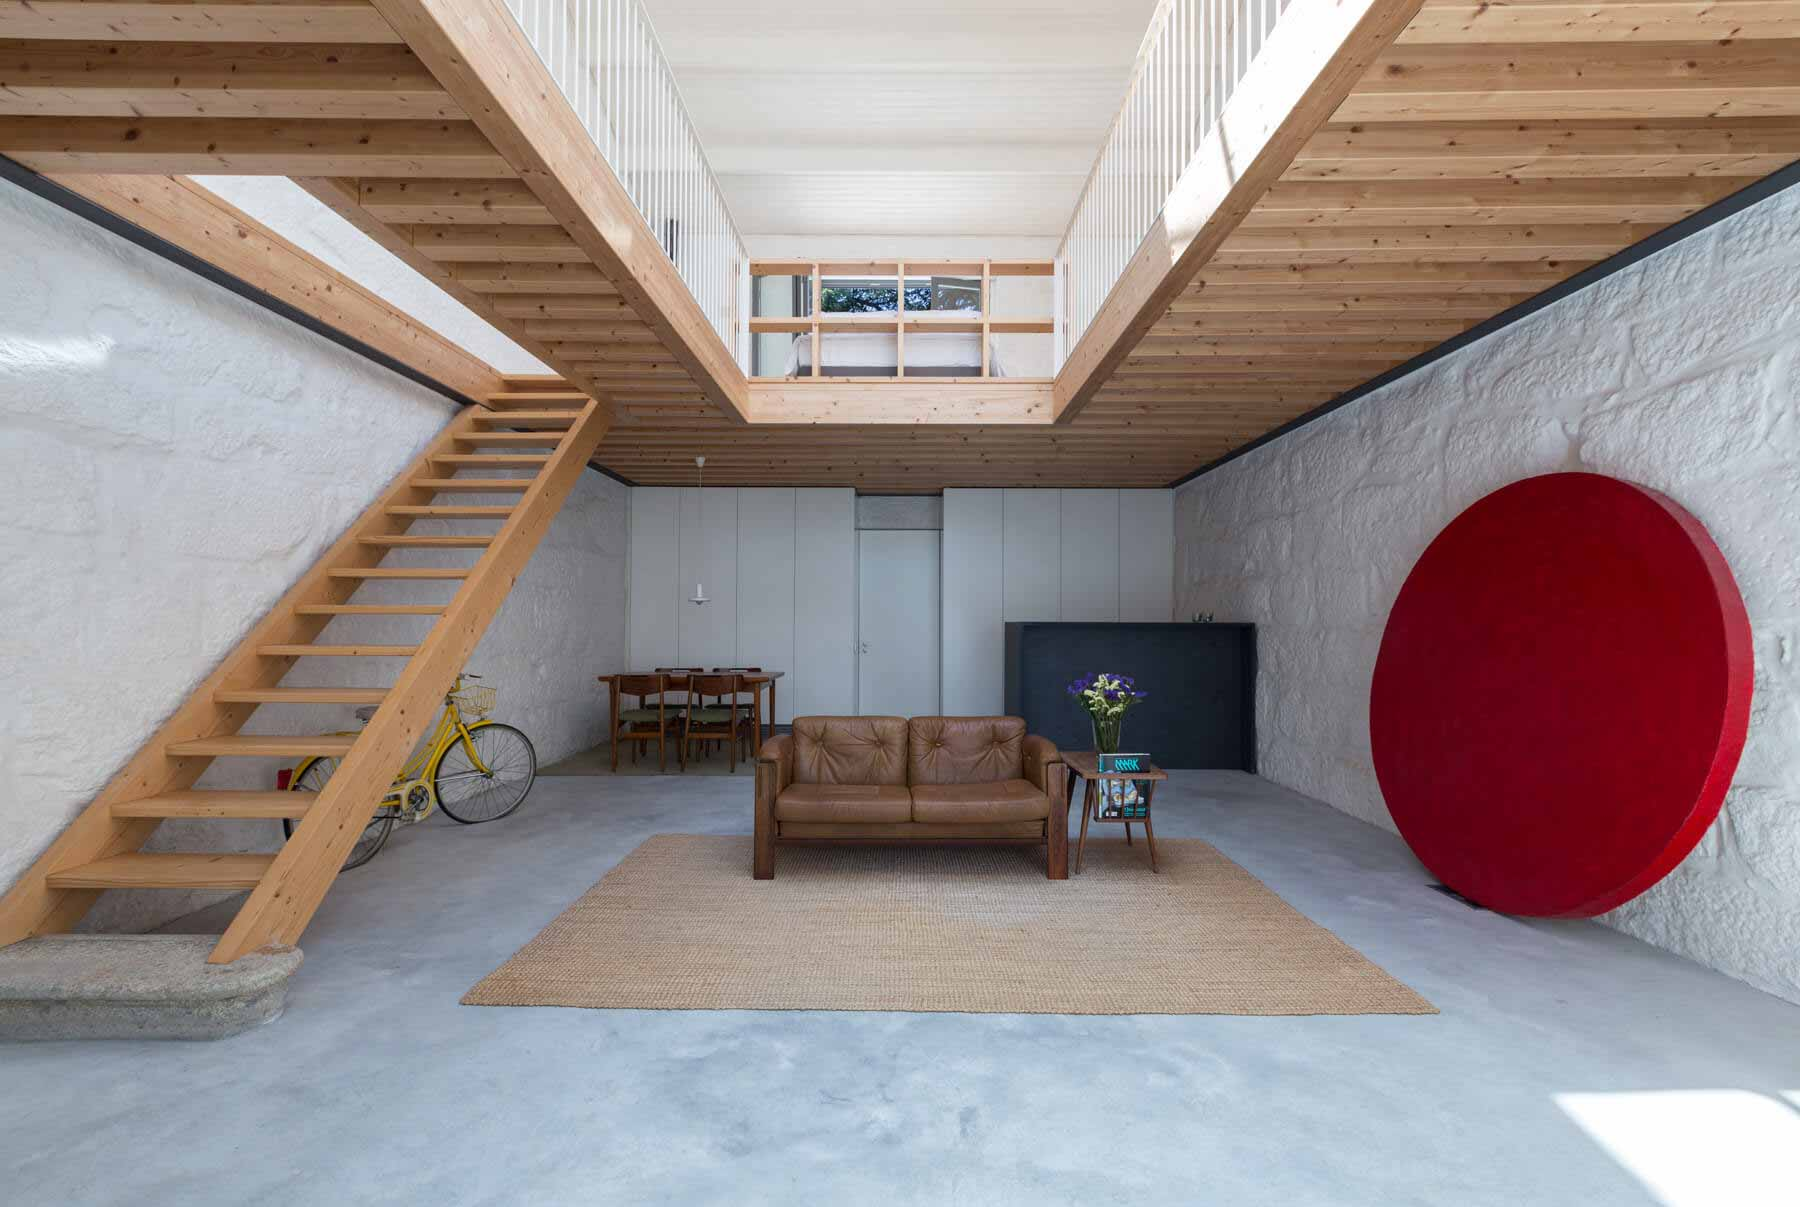 LSC House / Архитектурная студия Александра Лоурейро